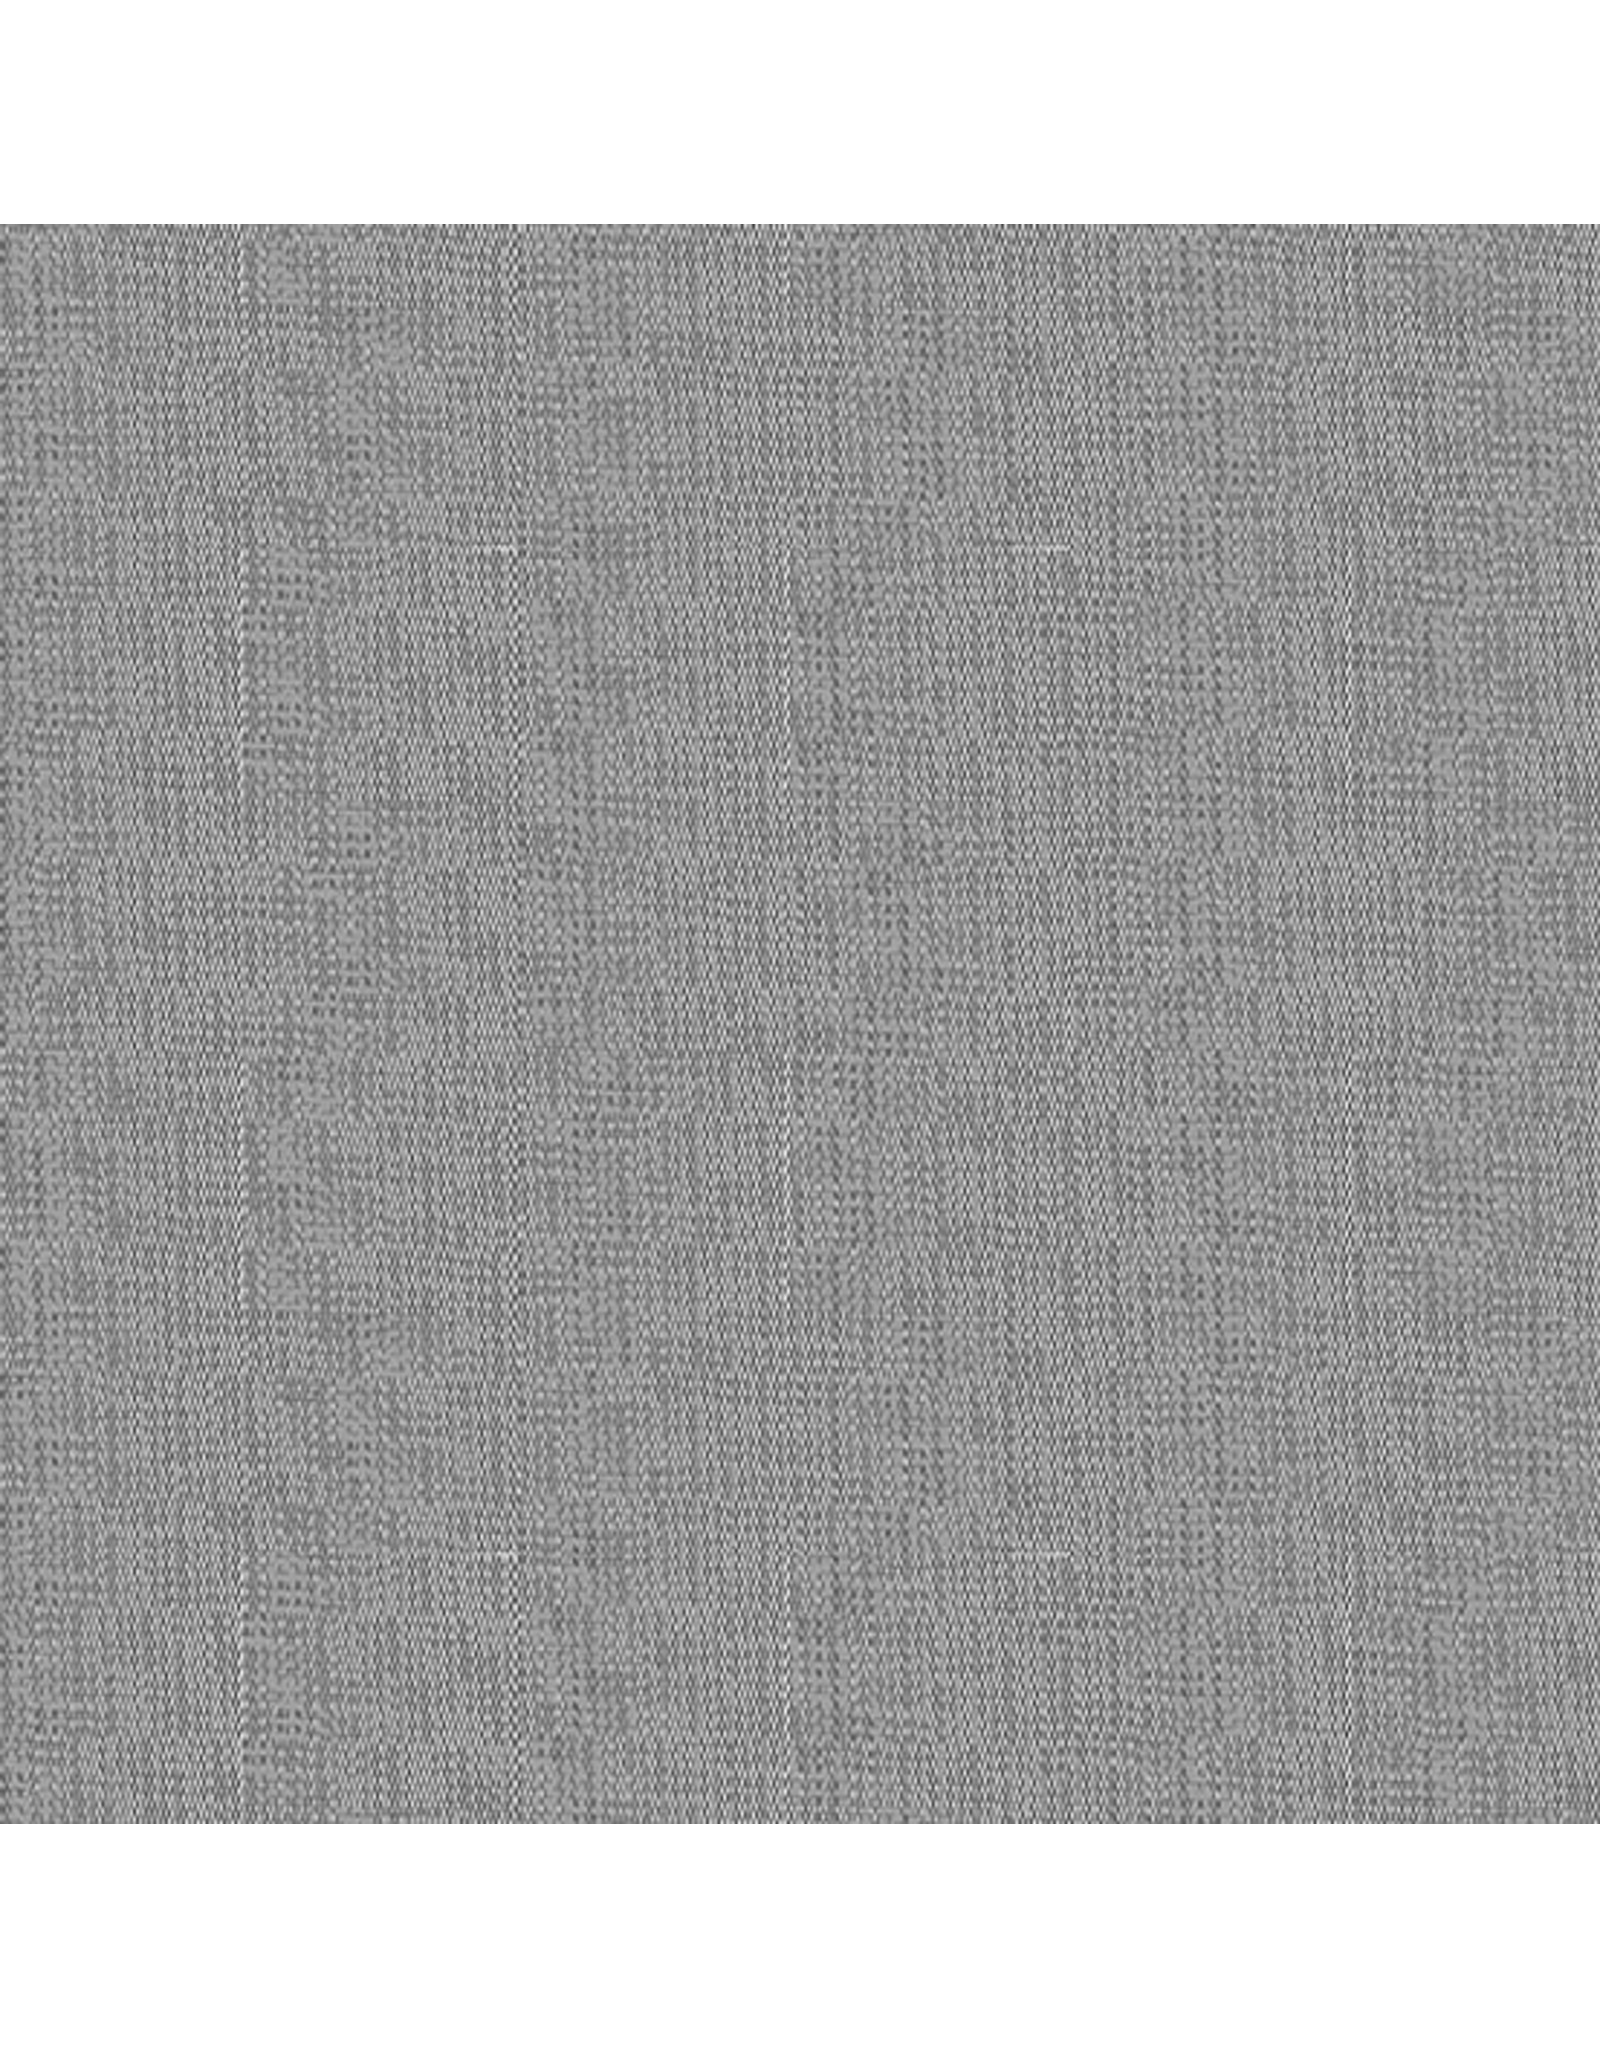 Alison Glass Kaleidoscope 2021 in Pepper, Fabric Half-Yards K-12